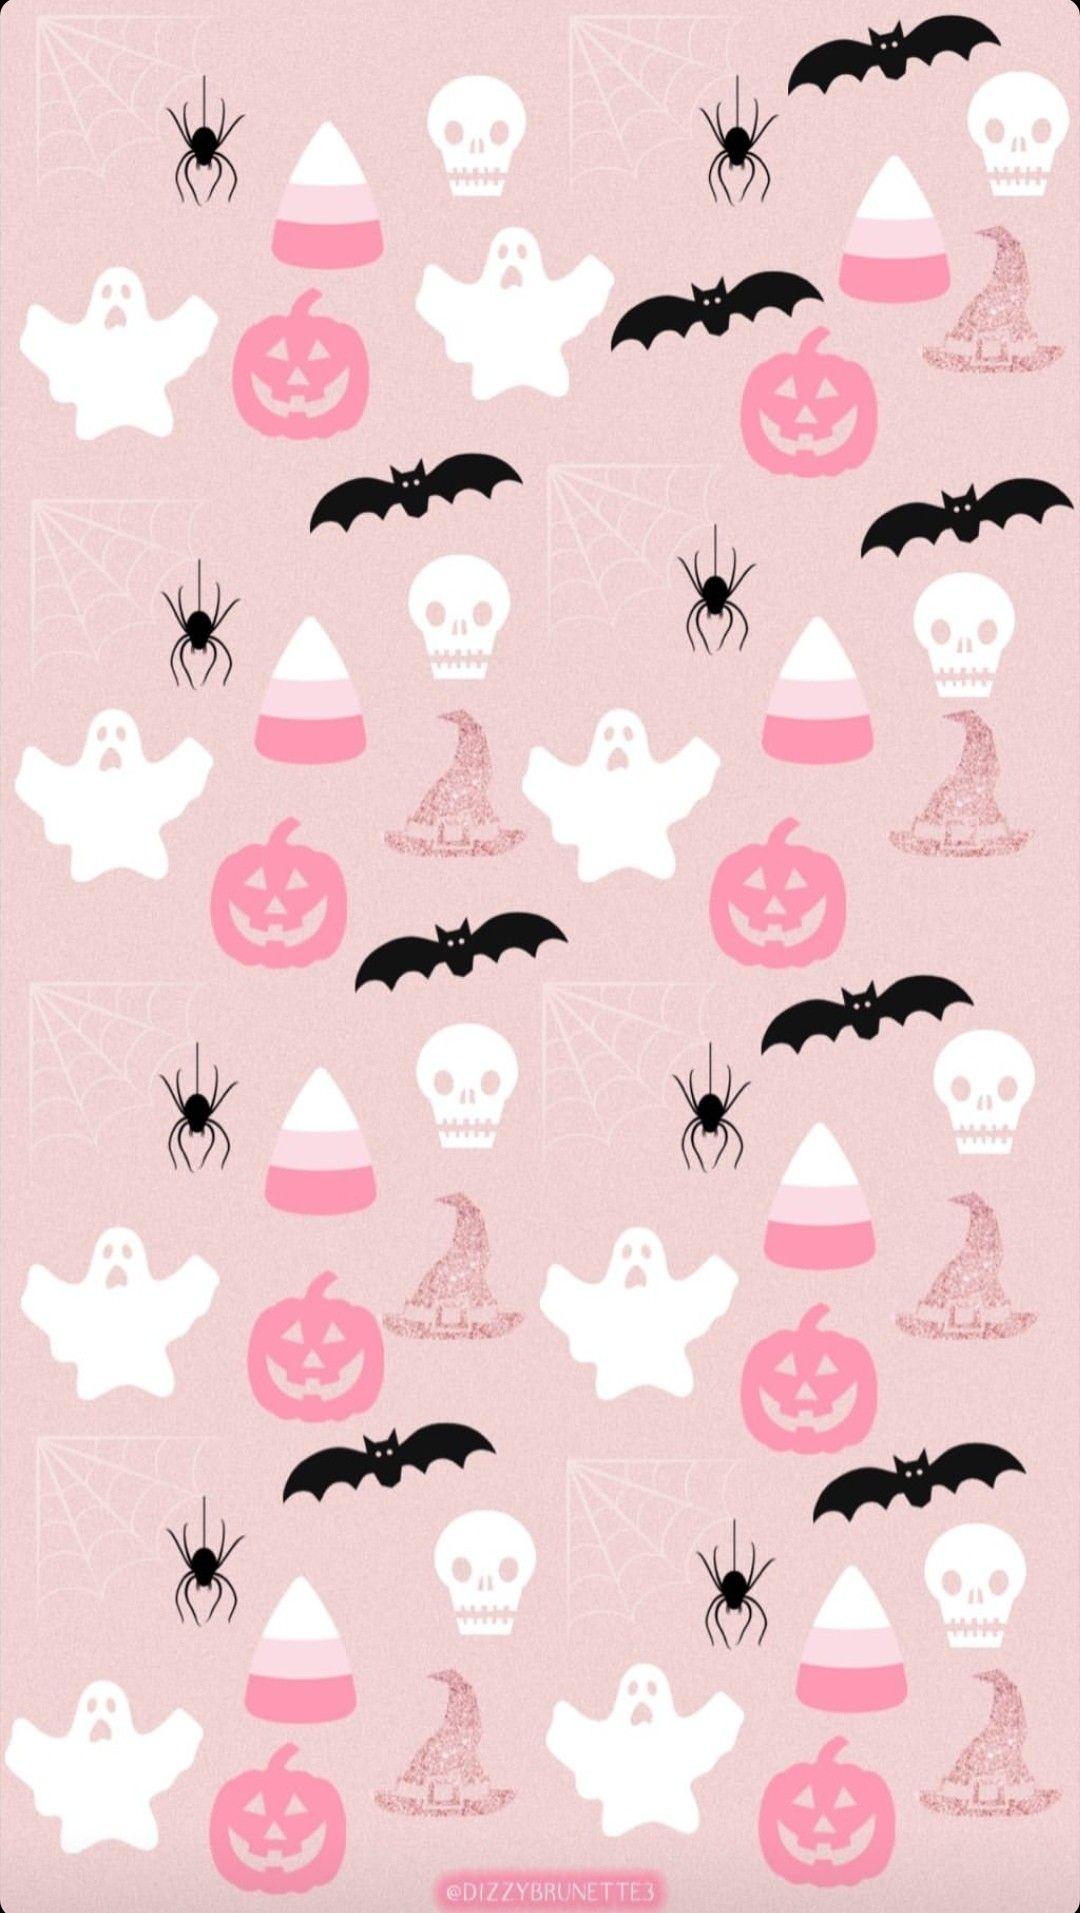 Pin By Sumaira Anjum On Suma Halloween Wallpaper Iphone Cute Fall Wallpaper Pink Wallpaper Iphone